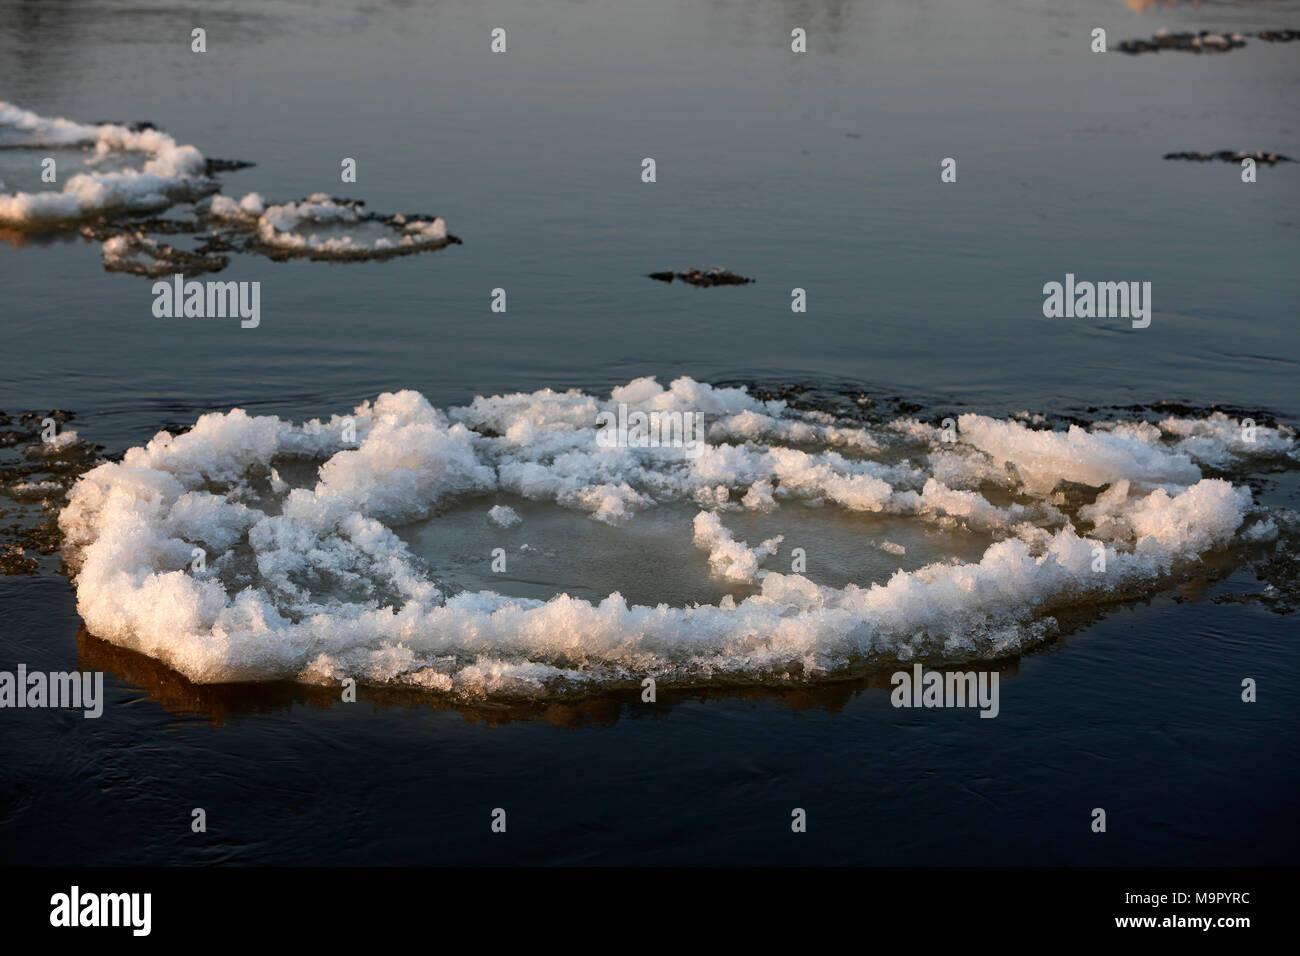 Ice floe, ice floe on the Elbe, Biosphere Reserve Middle Elbe, Dessau-Roßlau, Saxony-Anhalt, Germany - Stock Image